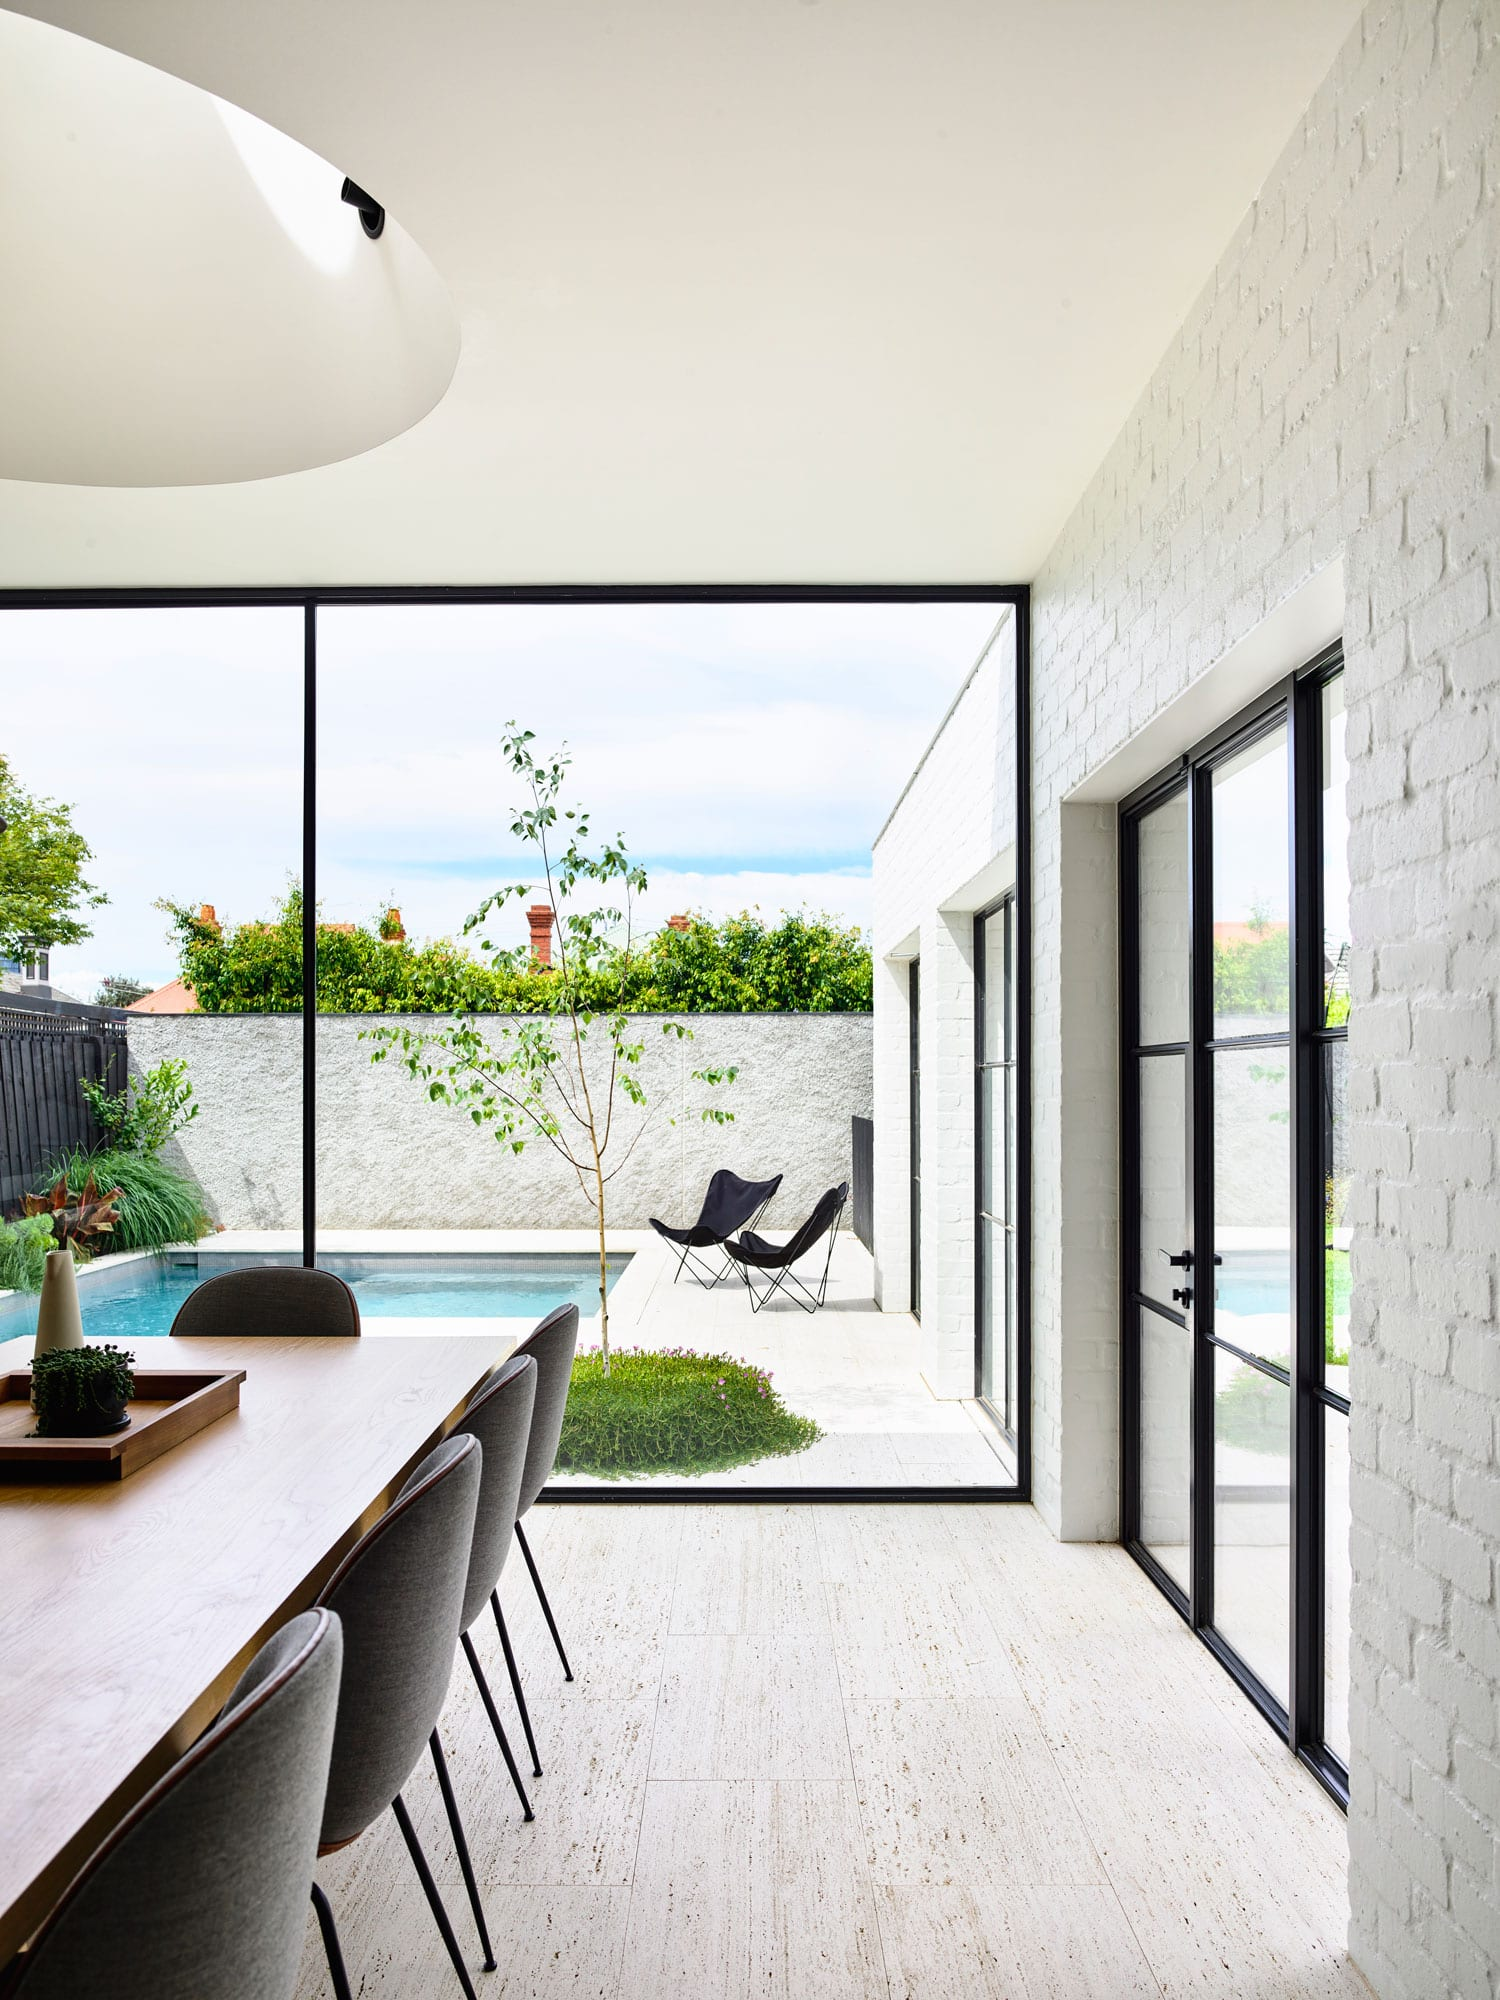 Malvern House, Melbourne by Kennedy Nolan | Yellowtrace